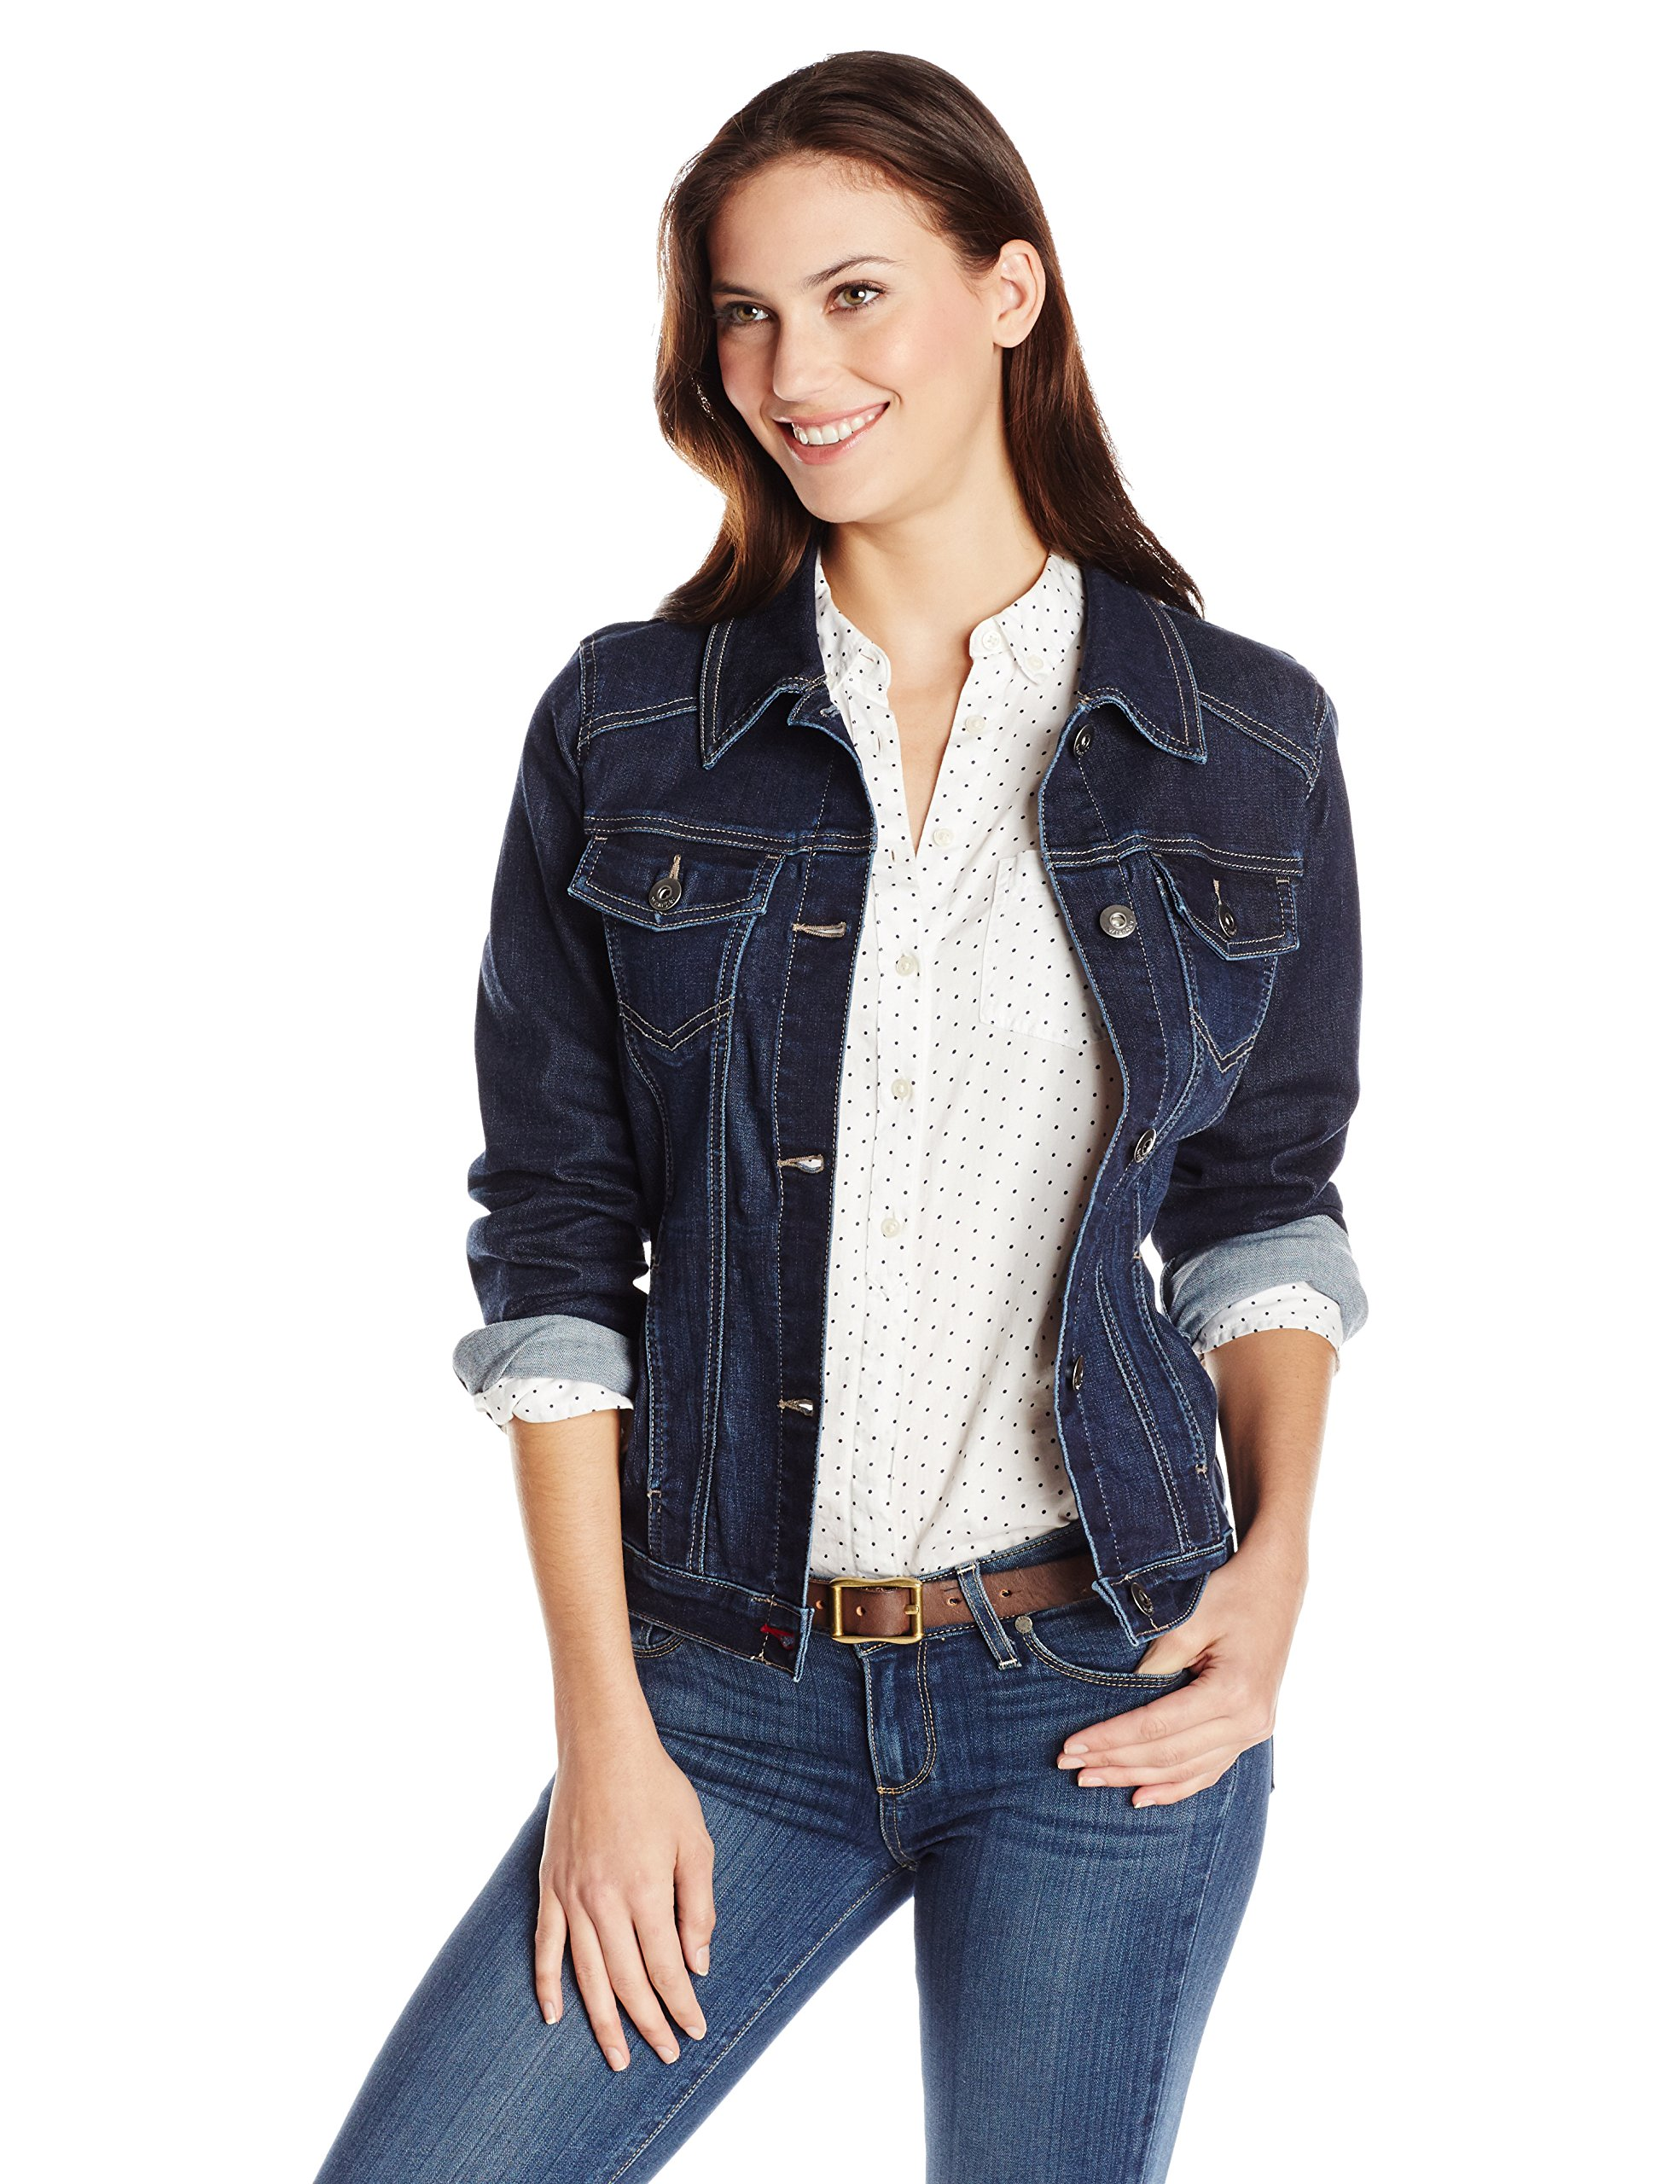 Wrangler Authentics Women's Denim Jacket, Drenched, Large